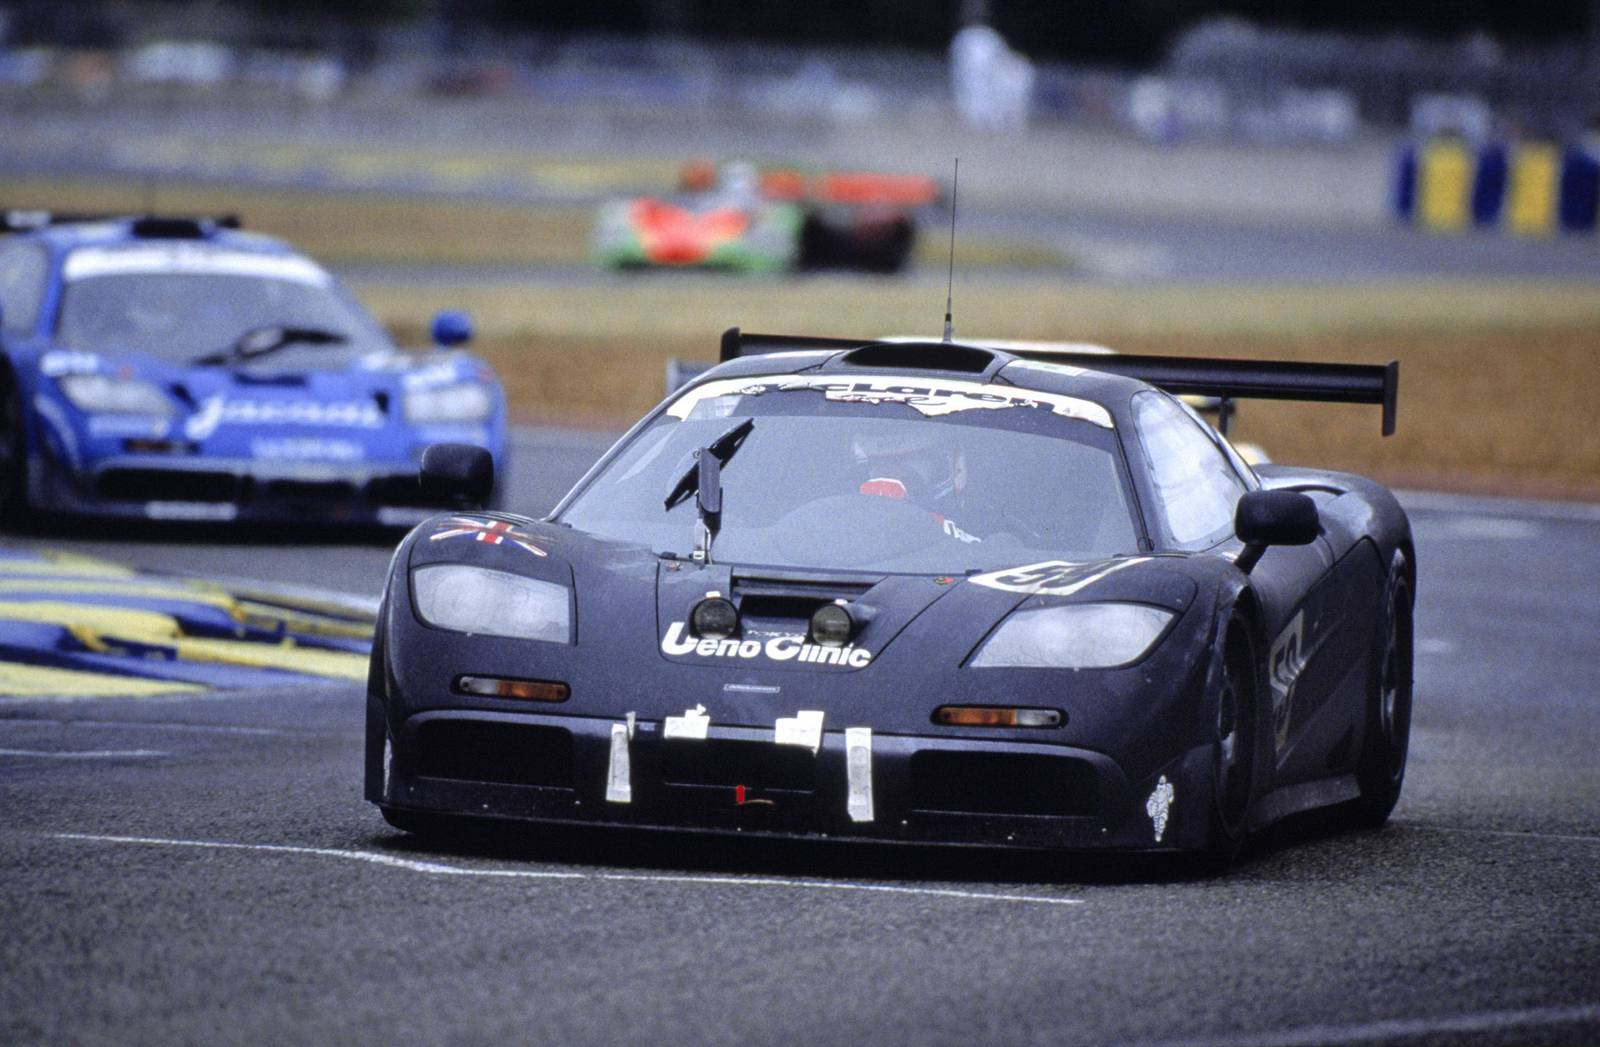 https://storage.googleapis.com/gtspirit/uploads/2015/05/McLaren-F1-GTR-9.jpg